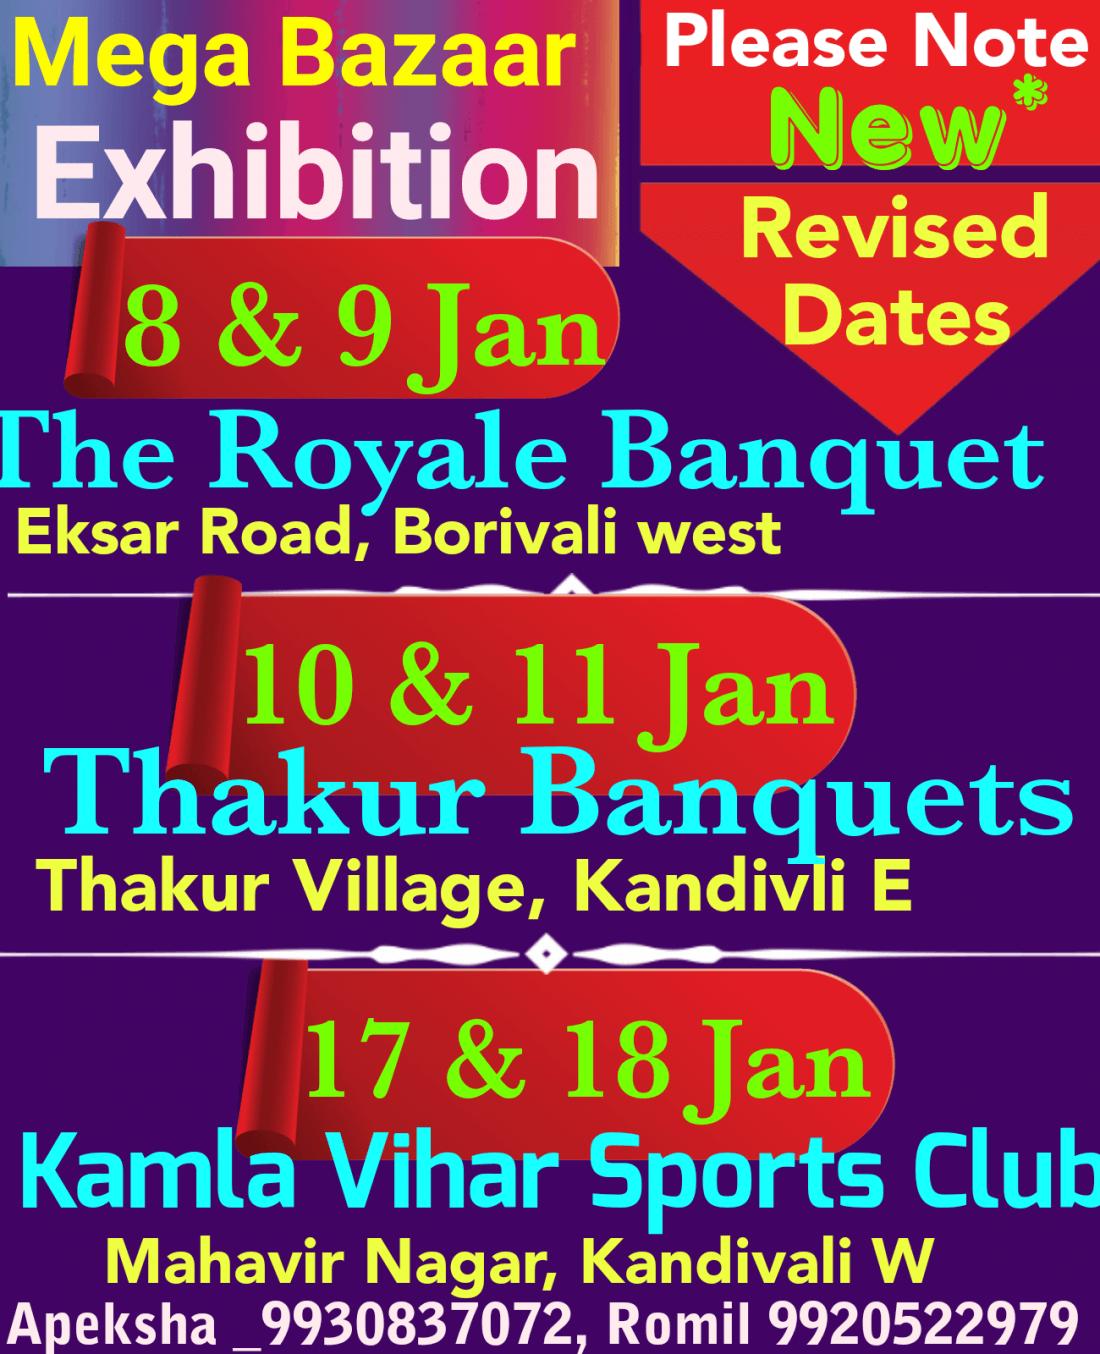 Mega Bazaar Winter Fair 2019 Exhibition of Fashion Ethnic WearJewelry & more 60 popup stalls